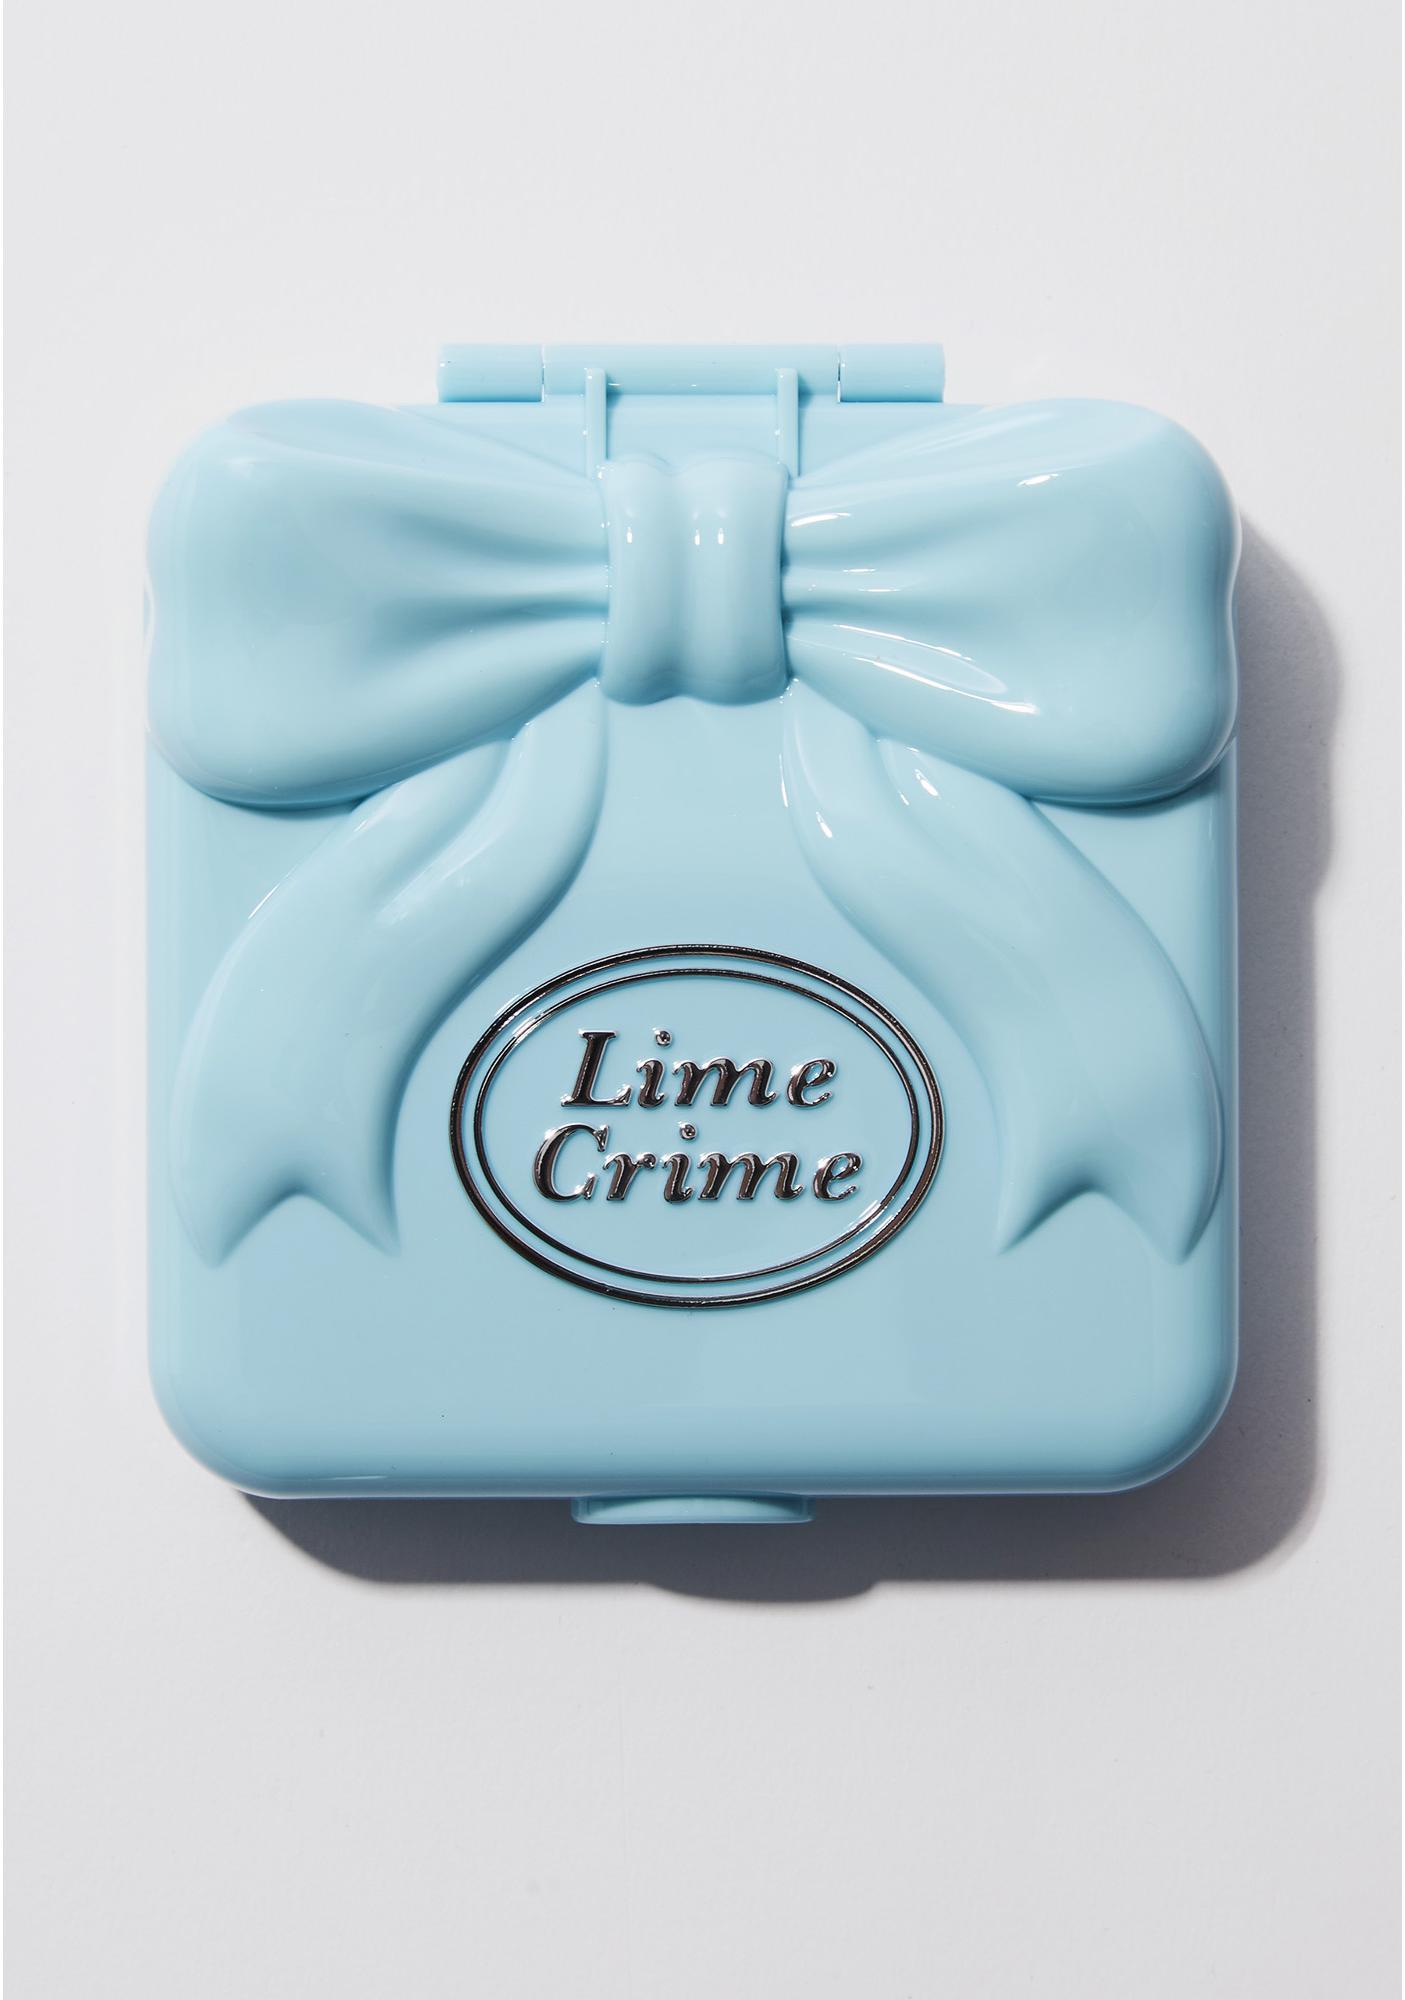 Lime Crime Bubblegum Pocket Candy Palette